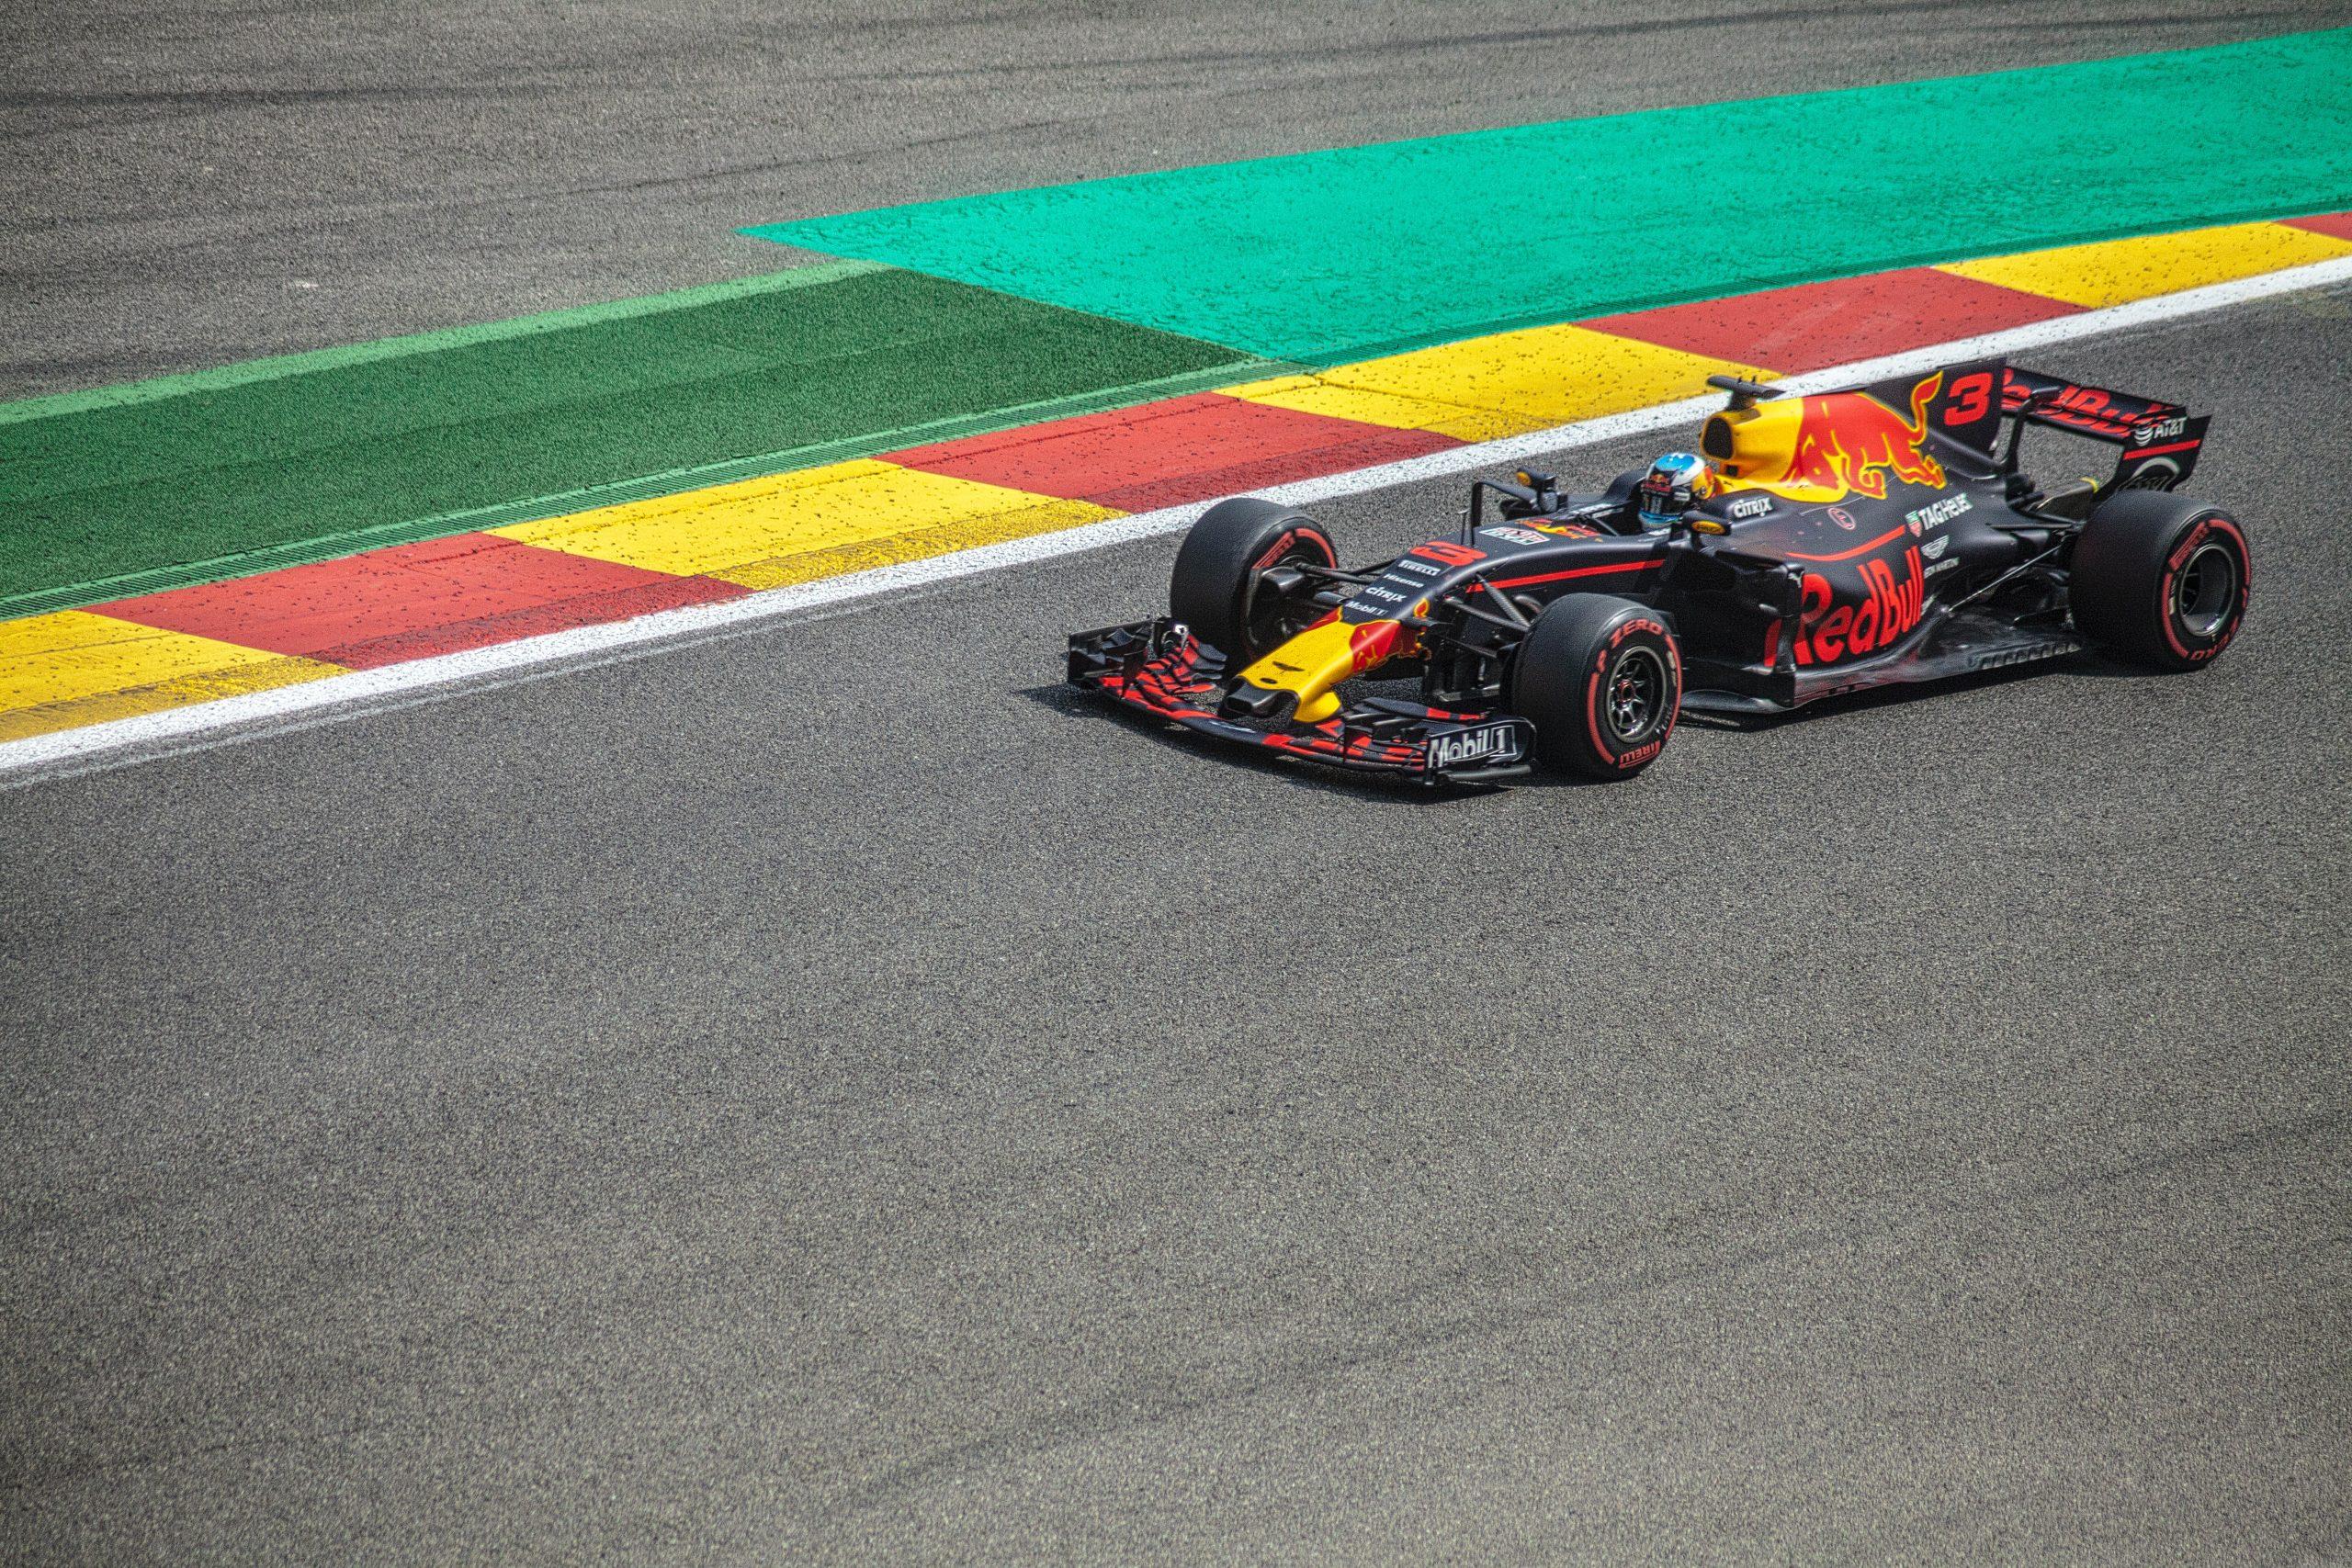 Camping SpaGP Package – GP België – Formule 1 Spa Francorchamps 2021